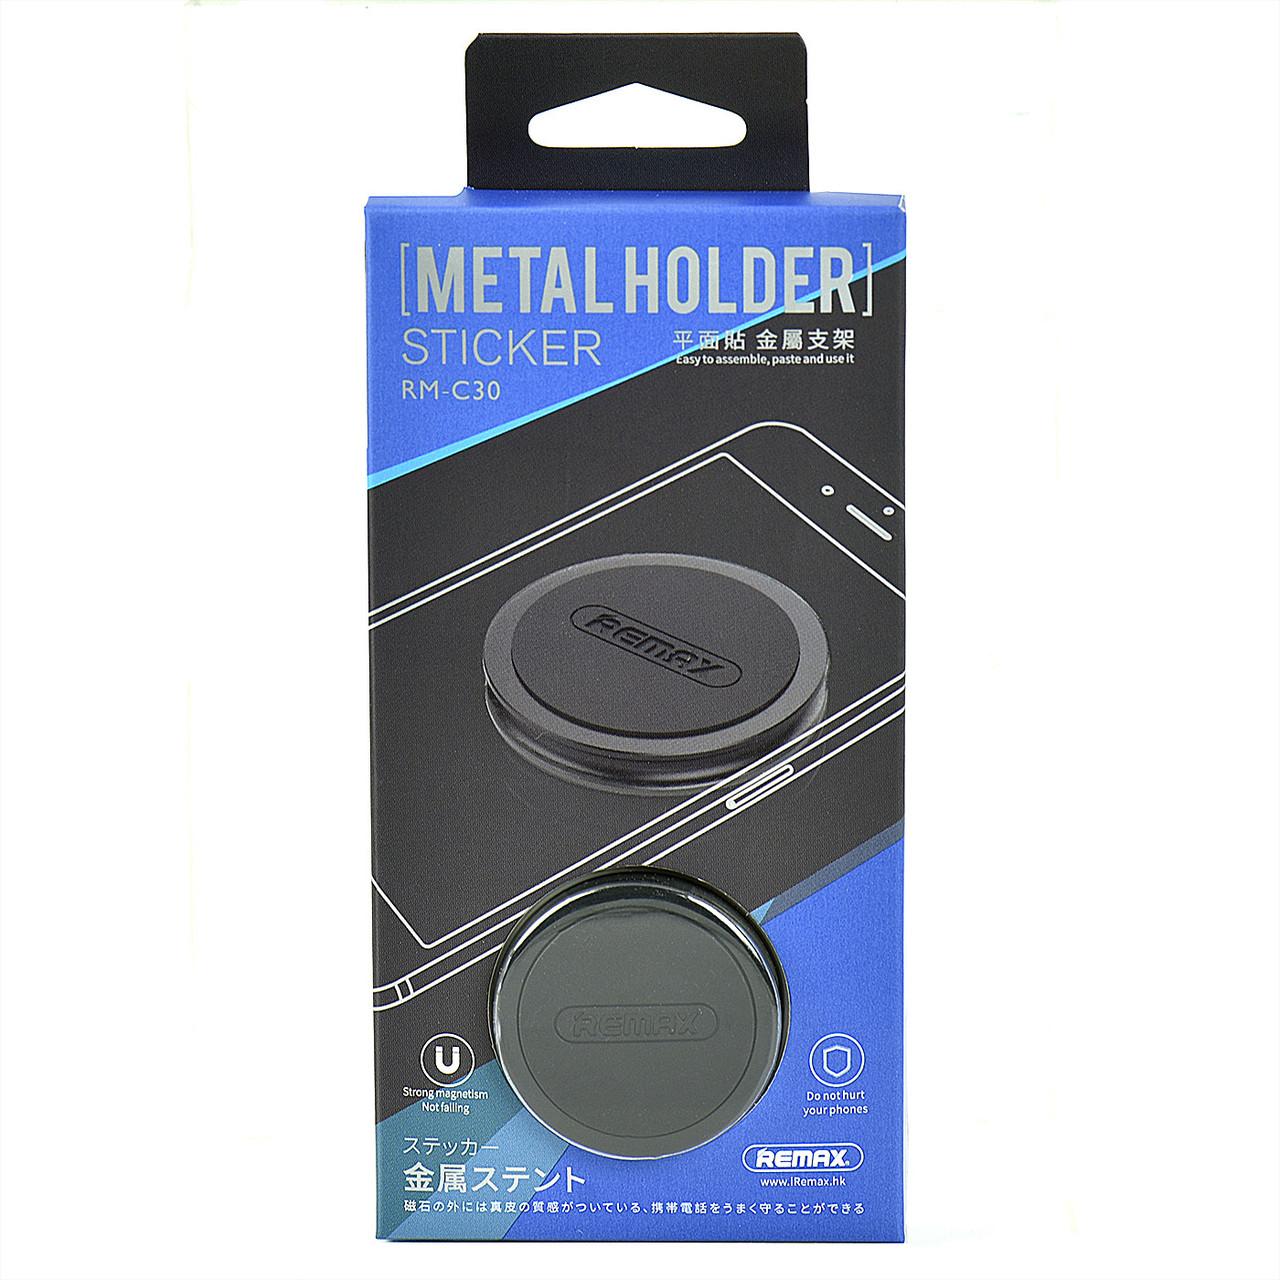 Автодержатель магнитный Remax RM-C30 Sticker Black